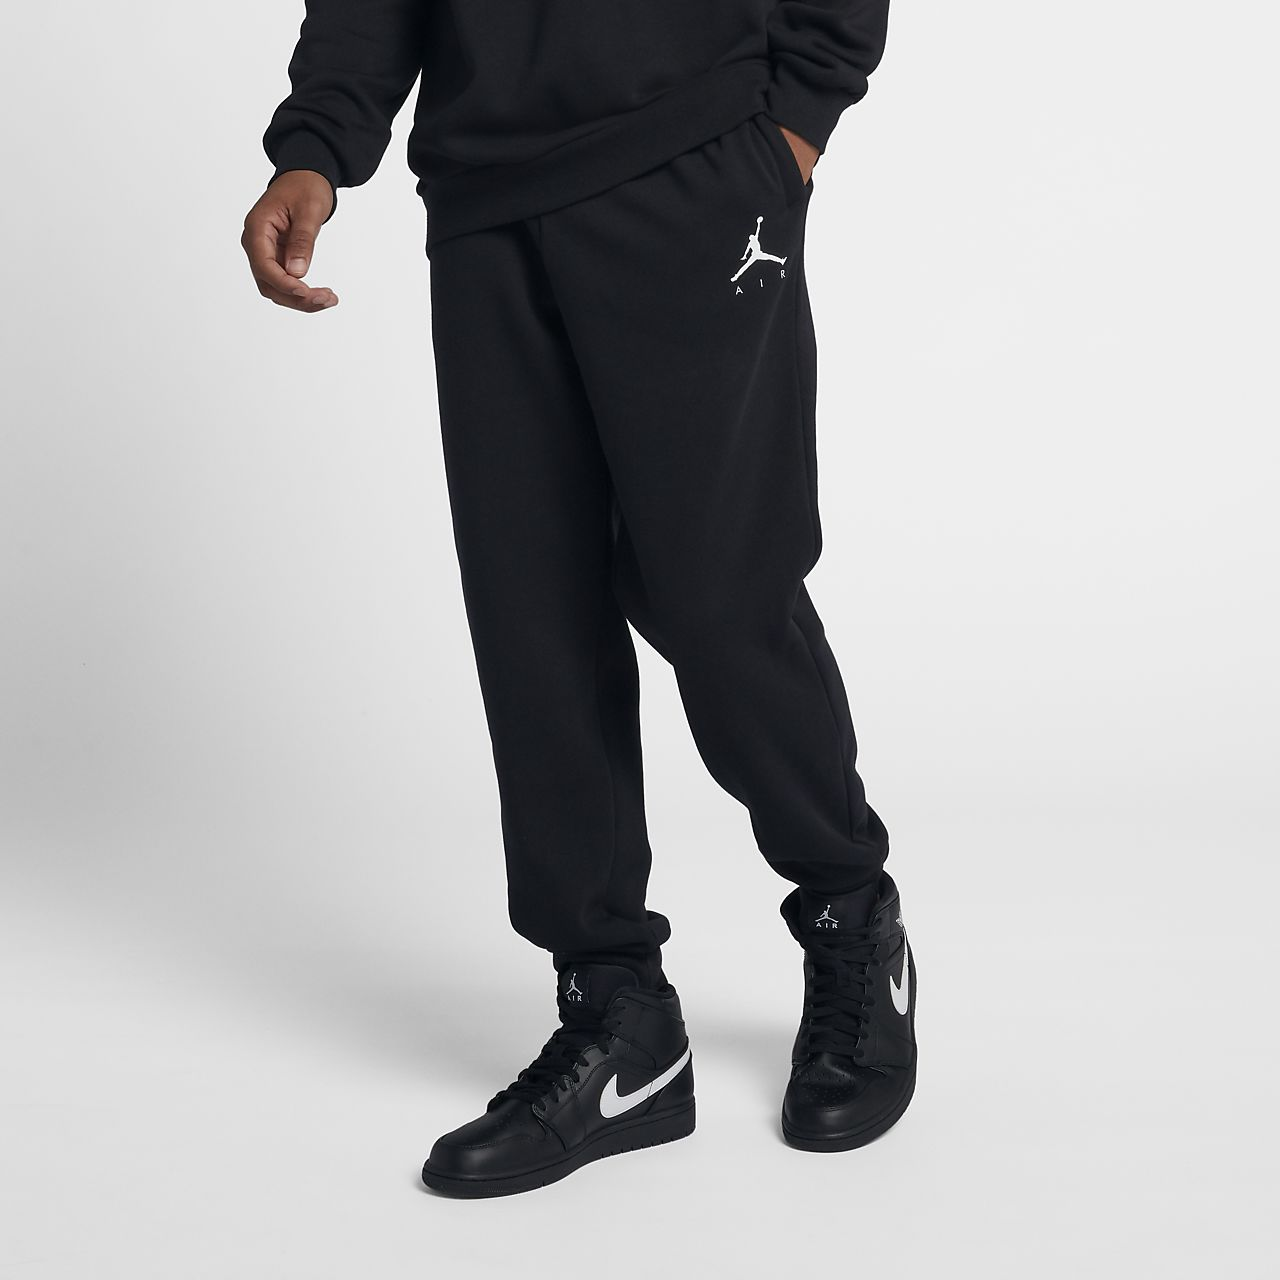 Jordan Jumpman Air Pantalons Fleece - Home